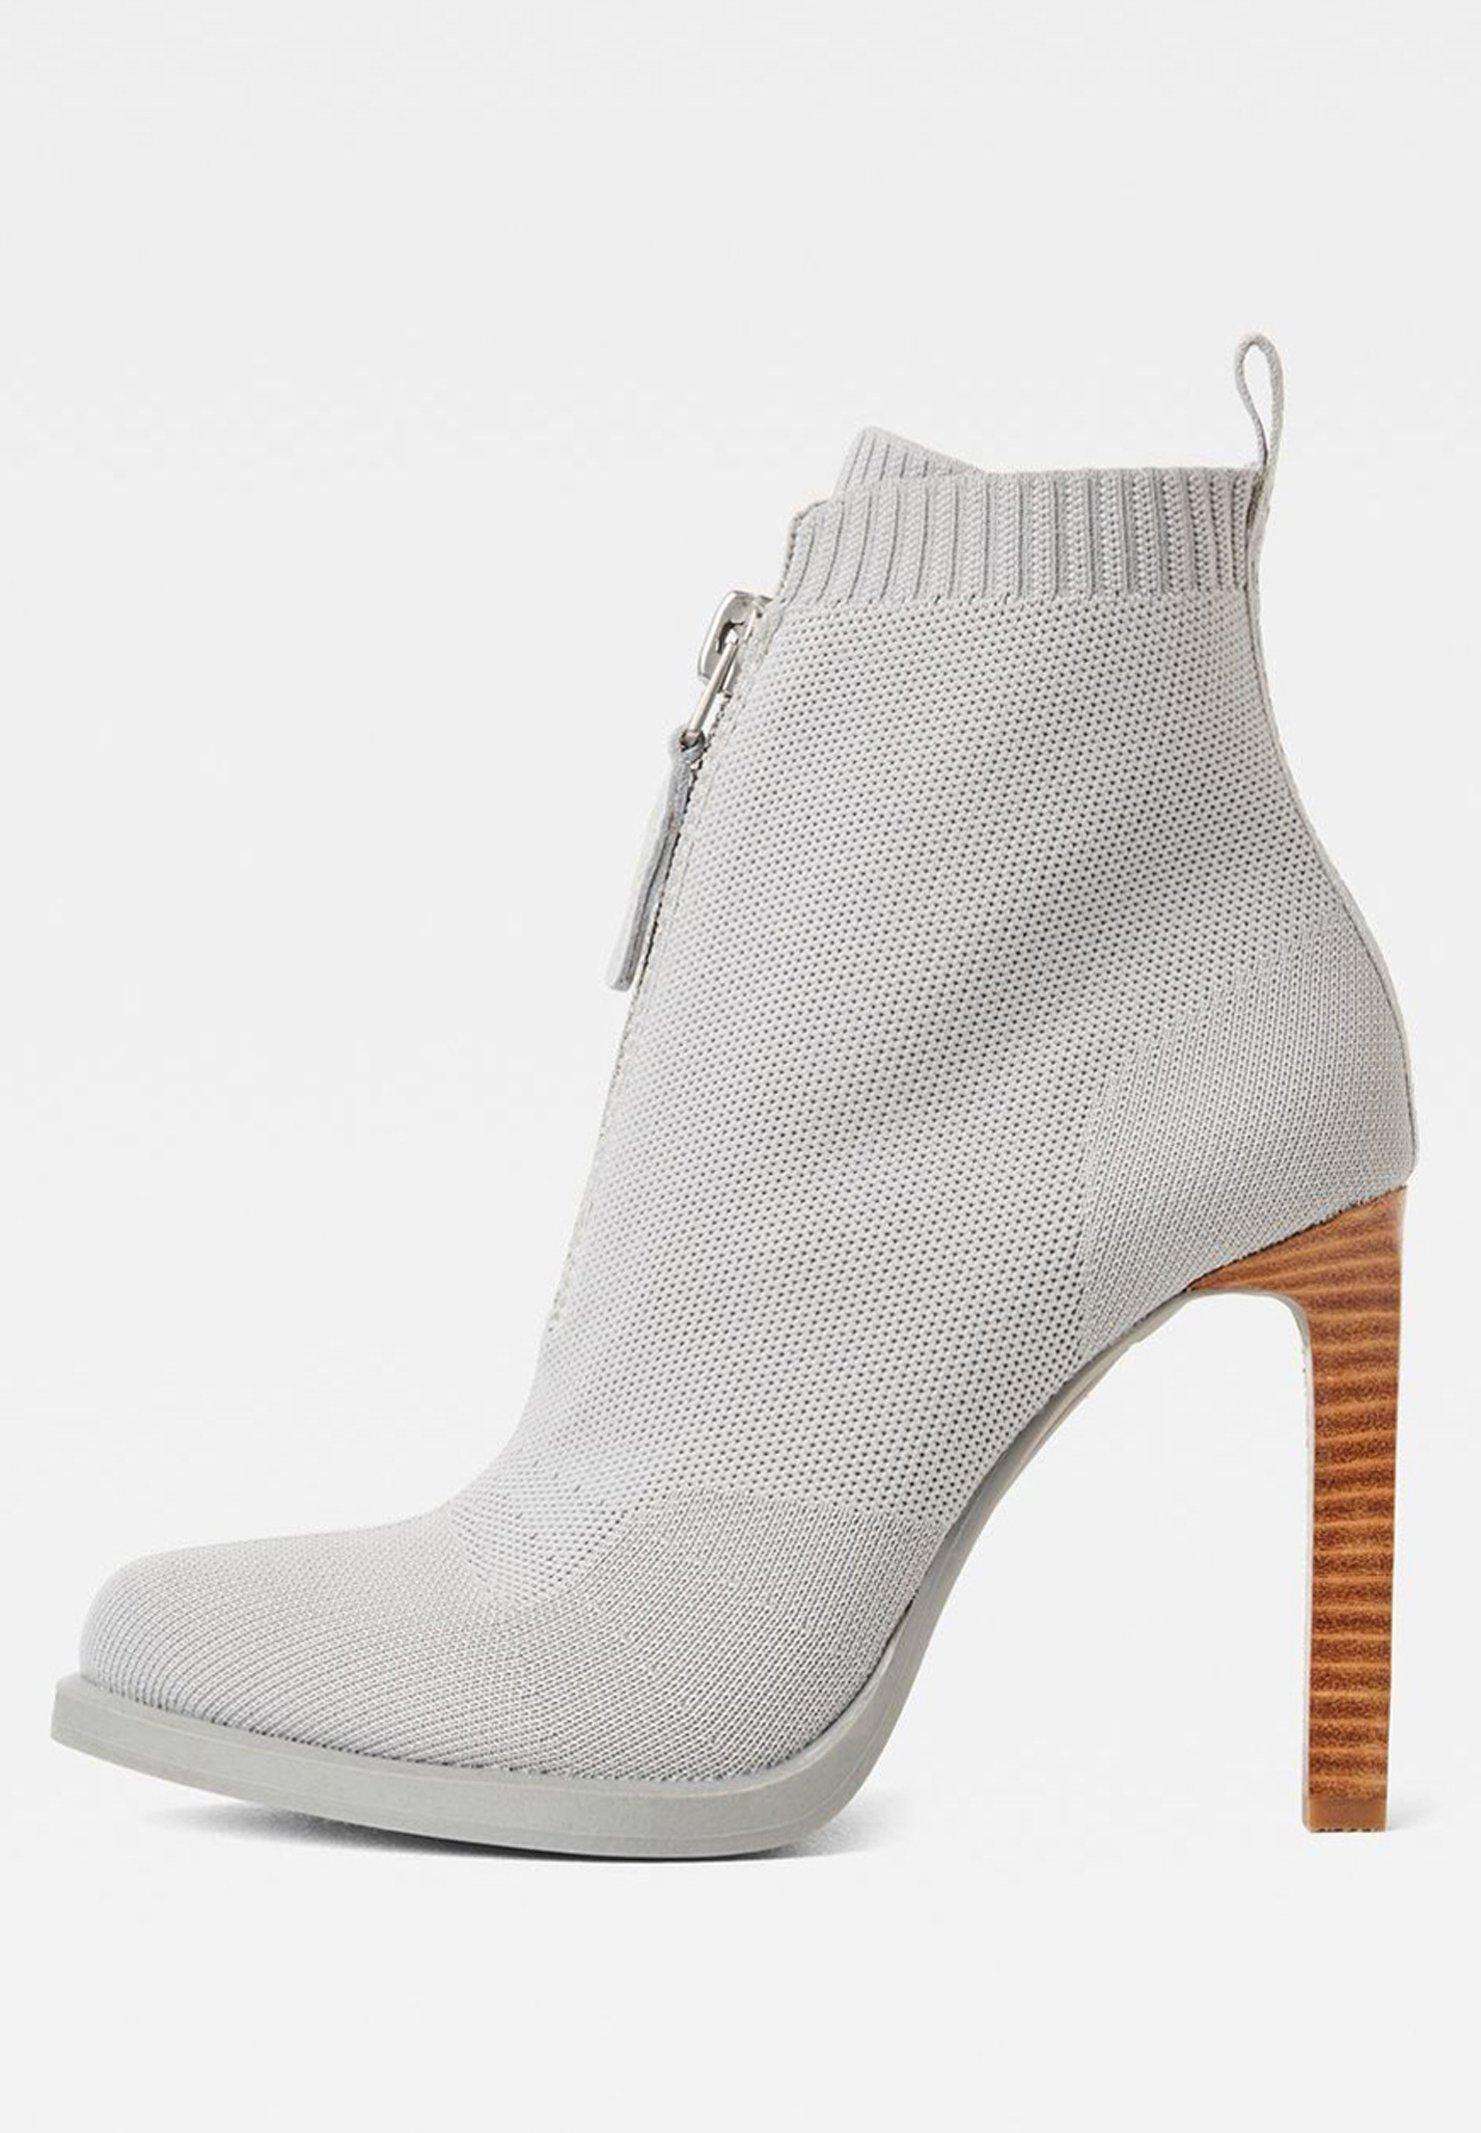 Scarpe donna G Star | Grande assortimento di calzature su